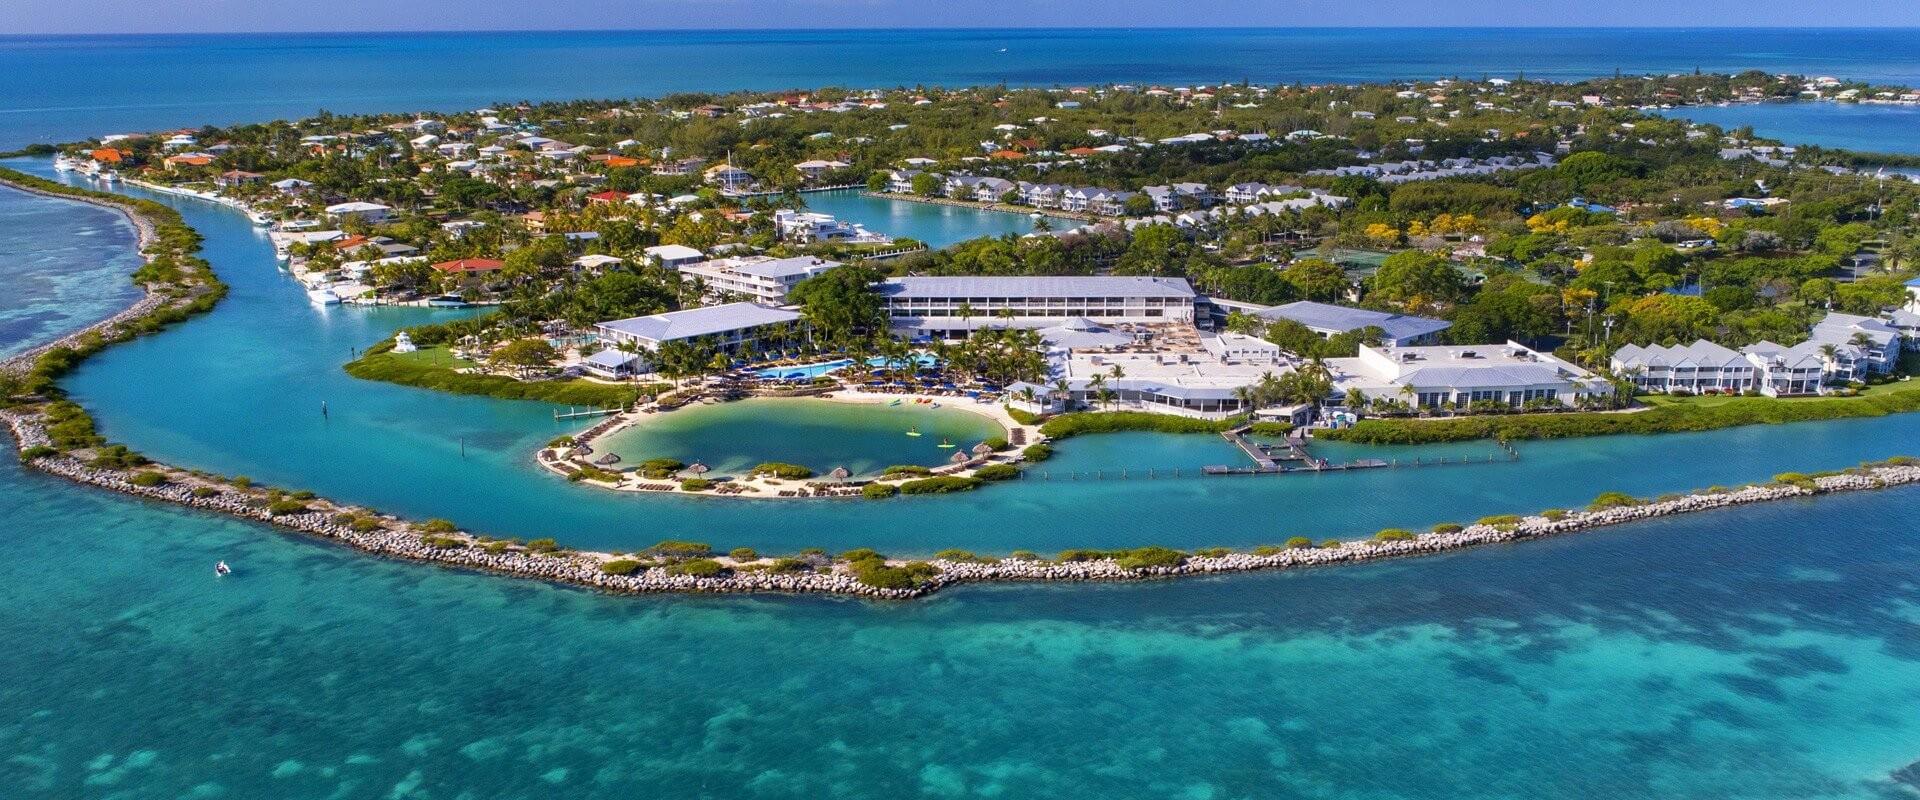 Covid 19 Hawks Cay Resort